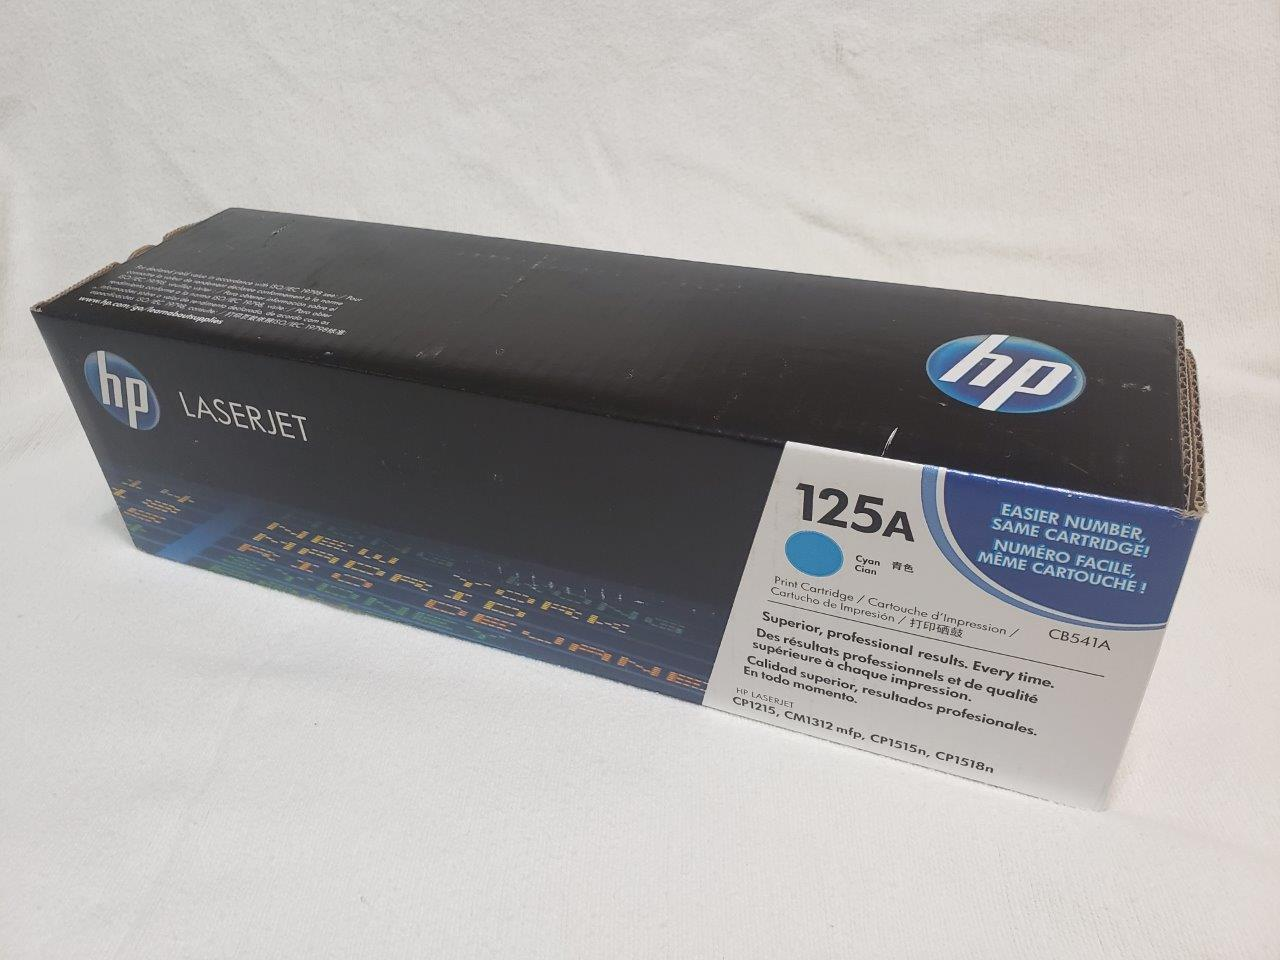 HP 125A Cyan Original LaserJet Toner Cartridge, CB541A Genuine Sealed for CM1312nfi CP1215 CP1518ni printers